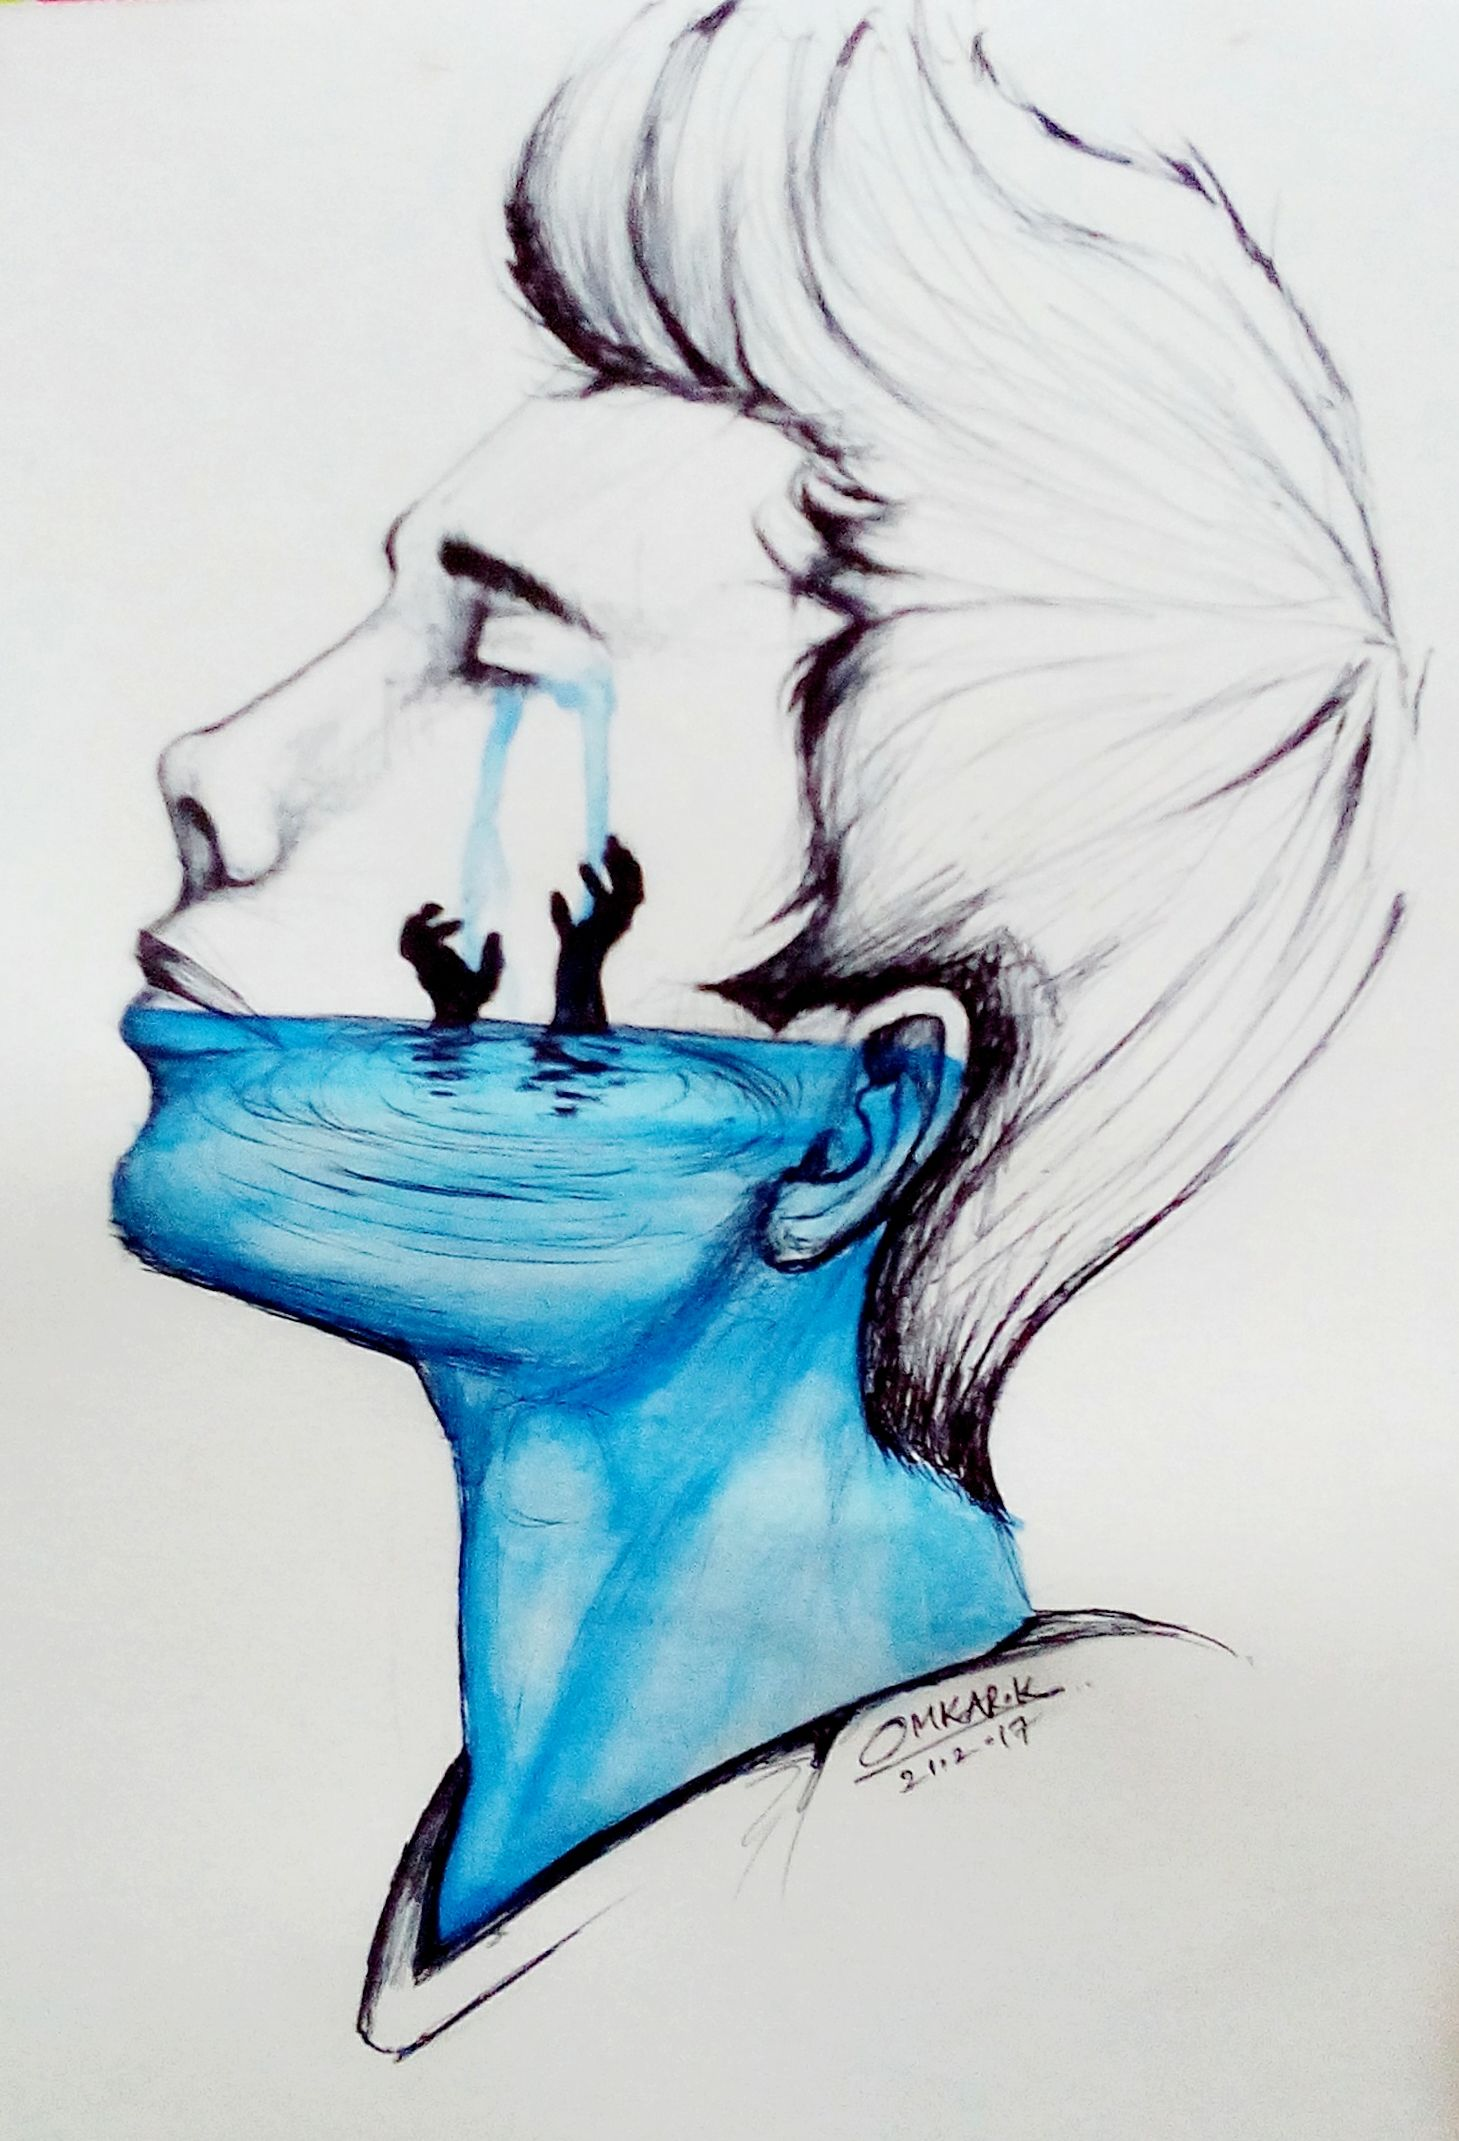 Emotional Deep Drawings : emotional, drawings, Paintings, Sketches, Omkar, Khochare